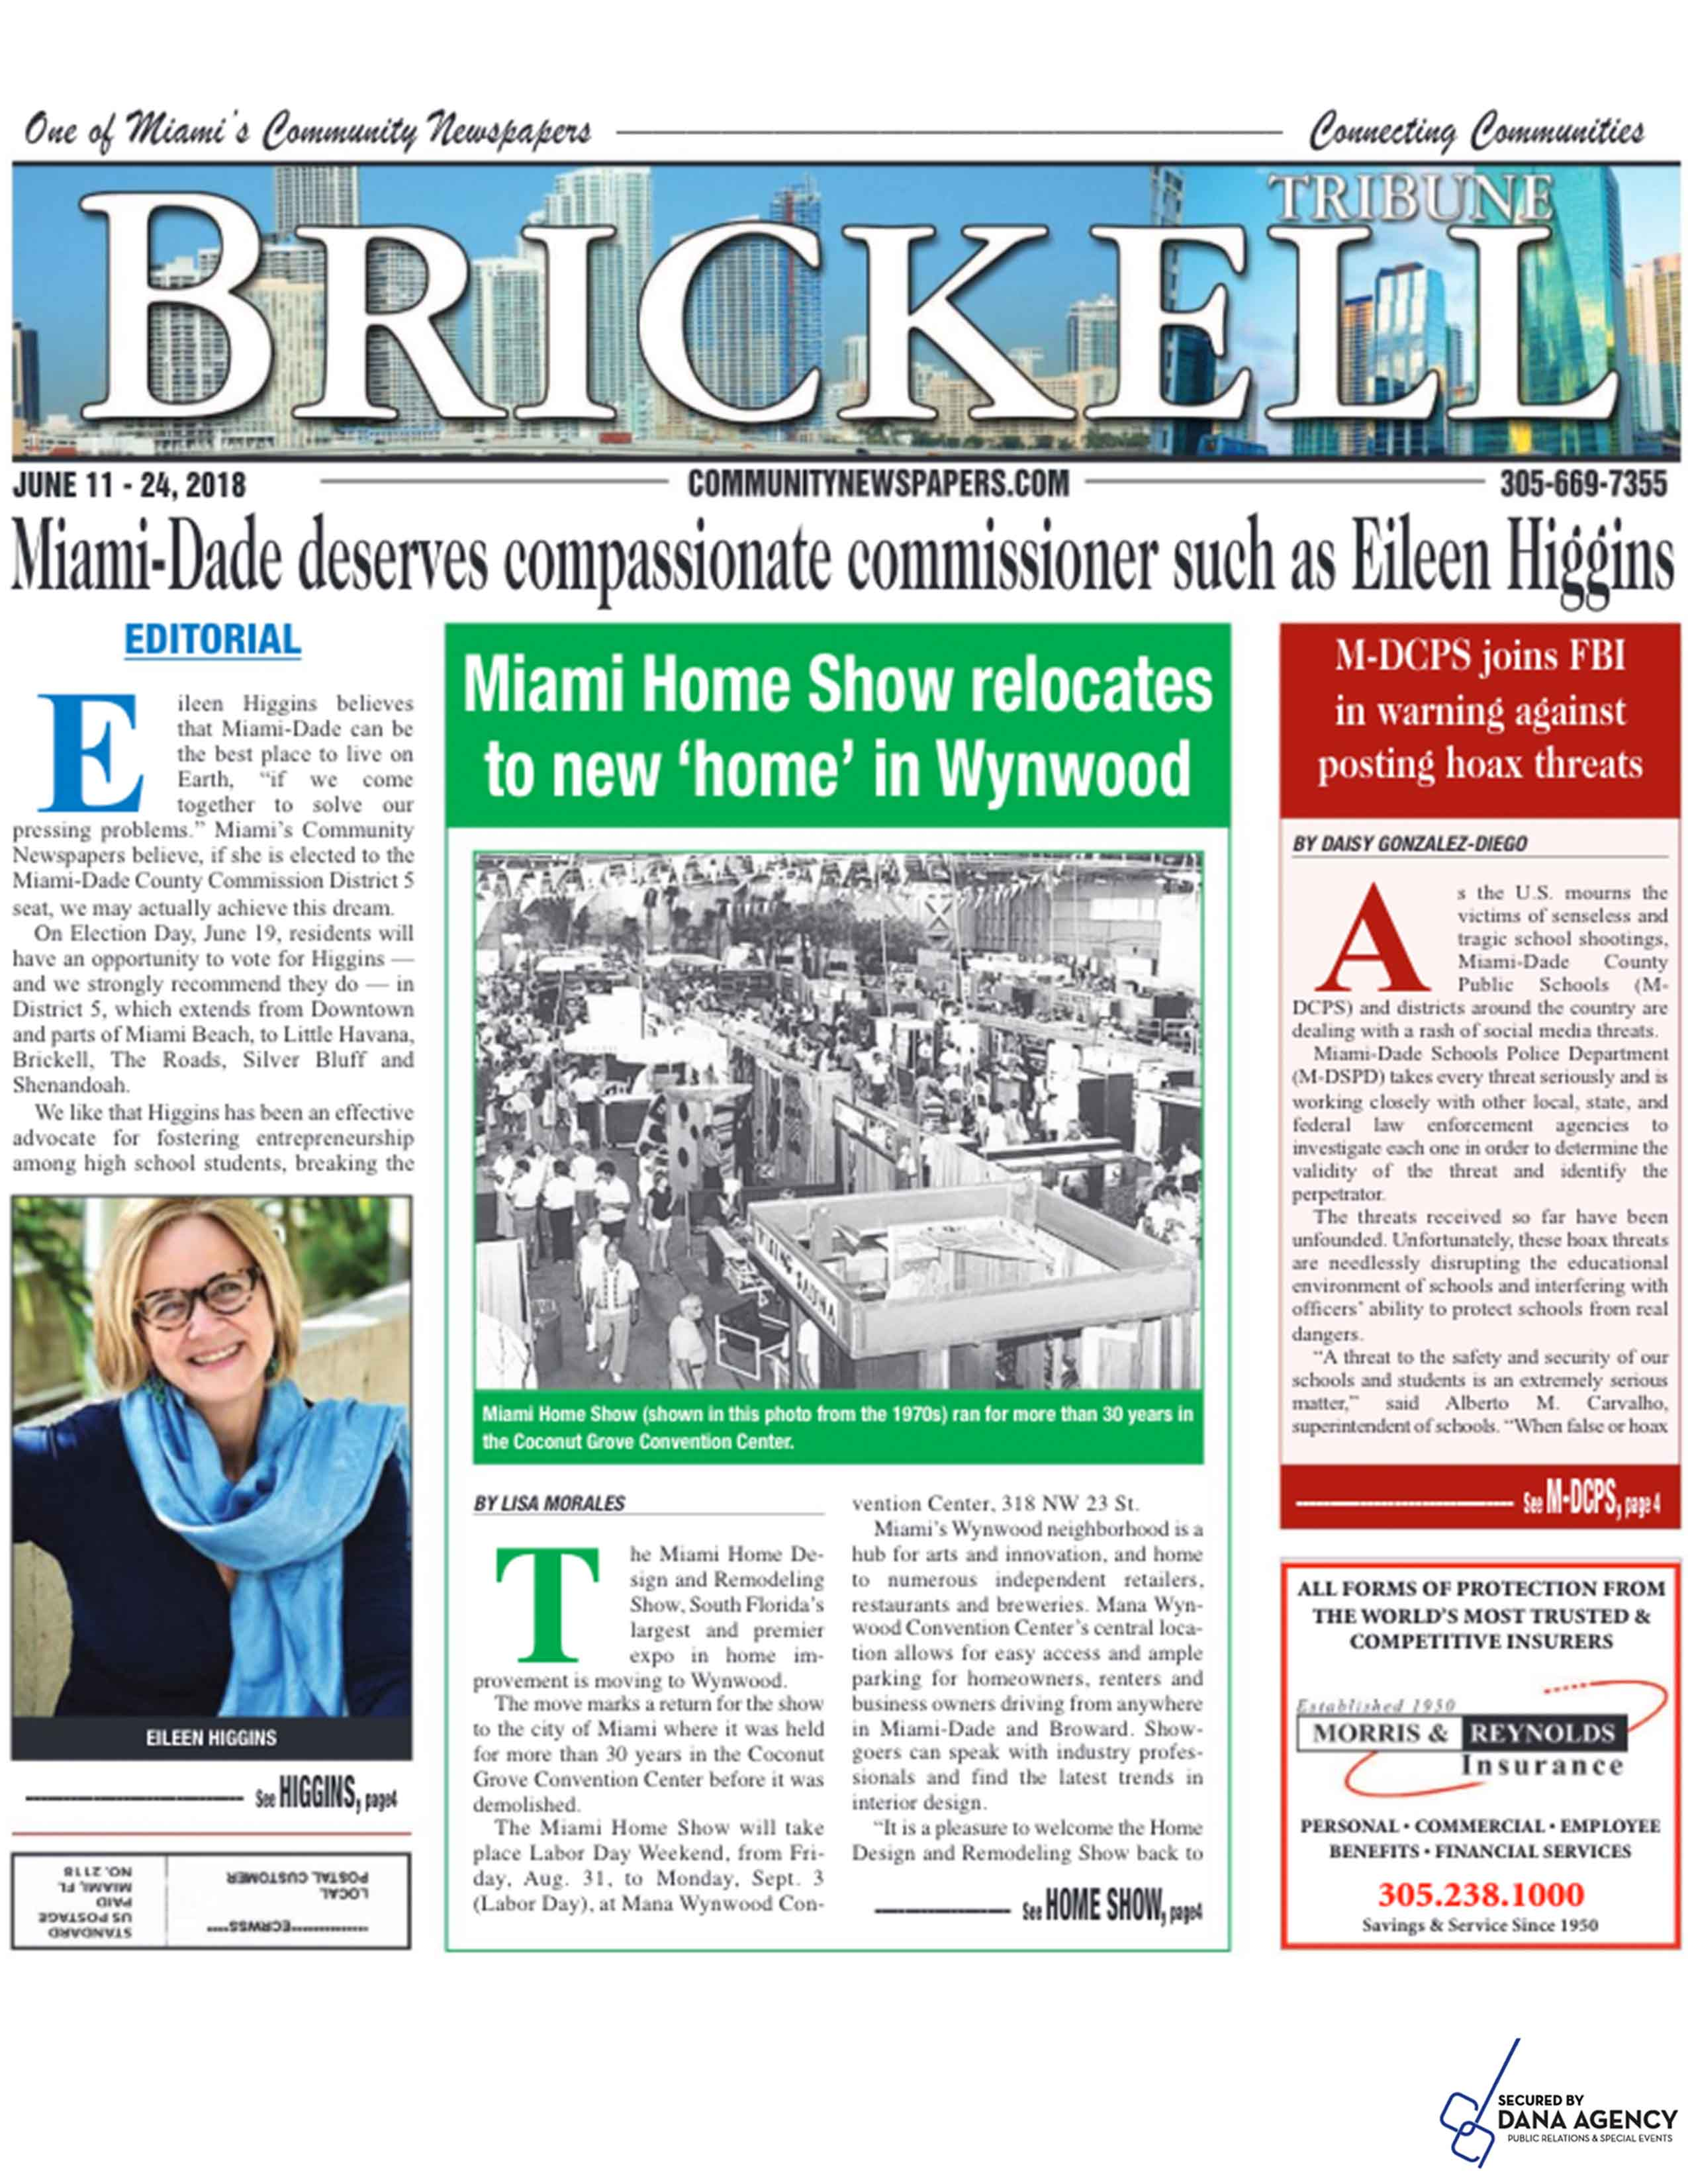 BrickellTribune_6.11.18_Print_Page1